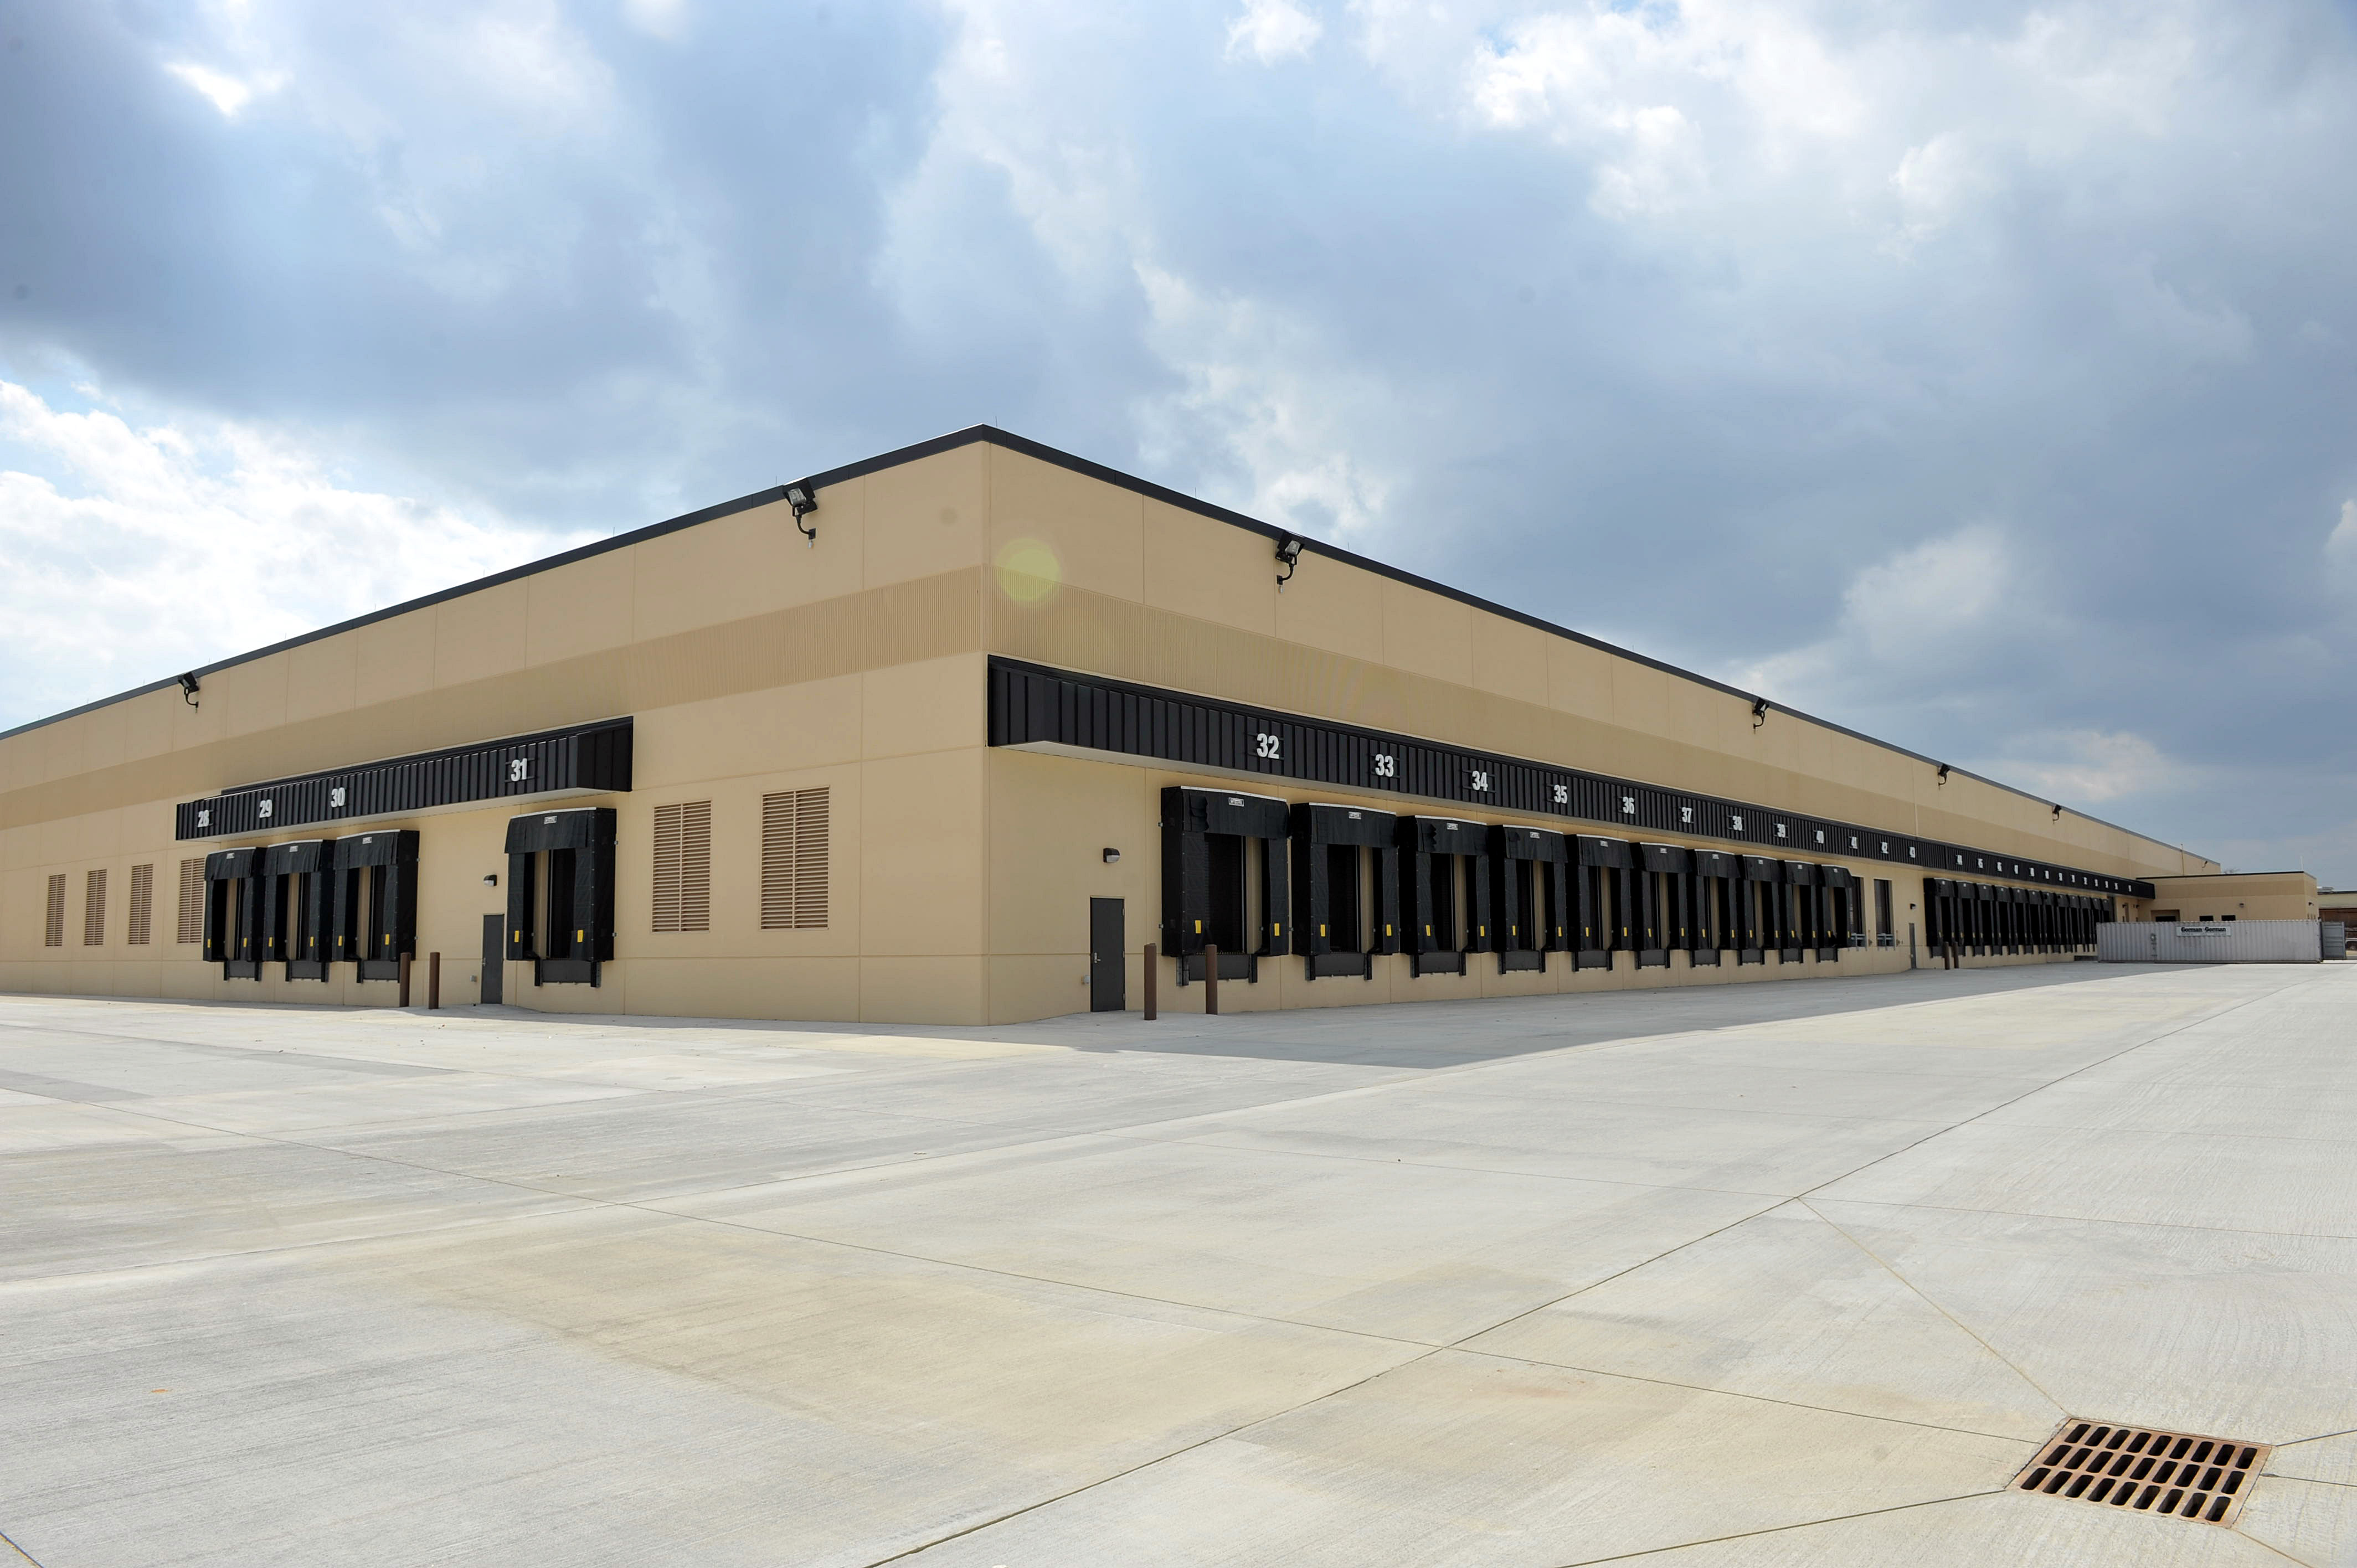 new dla warehouse set to open add jobs > robins air force base new dla warehouse set to open add jobs